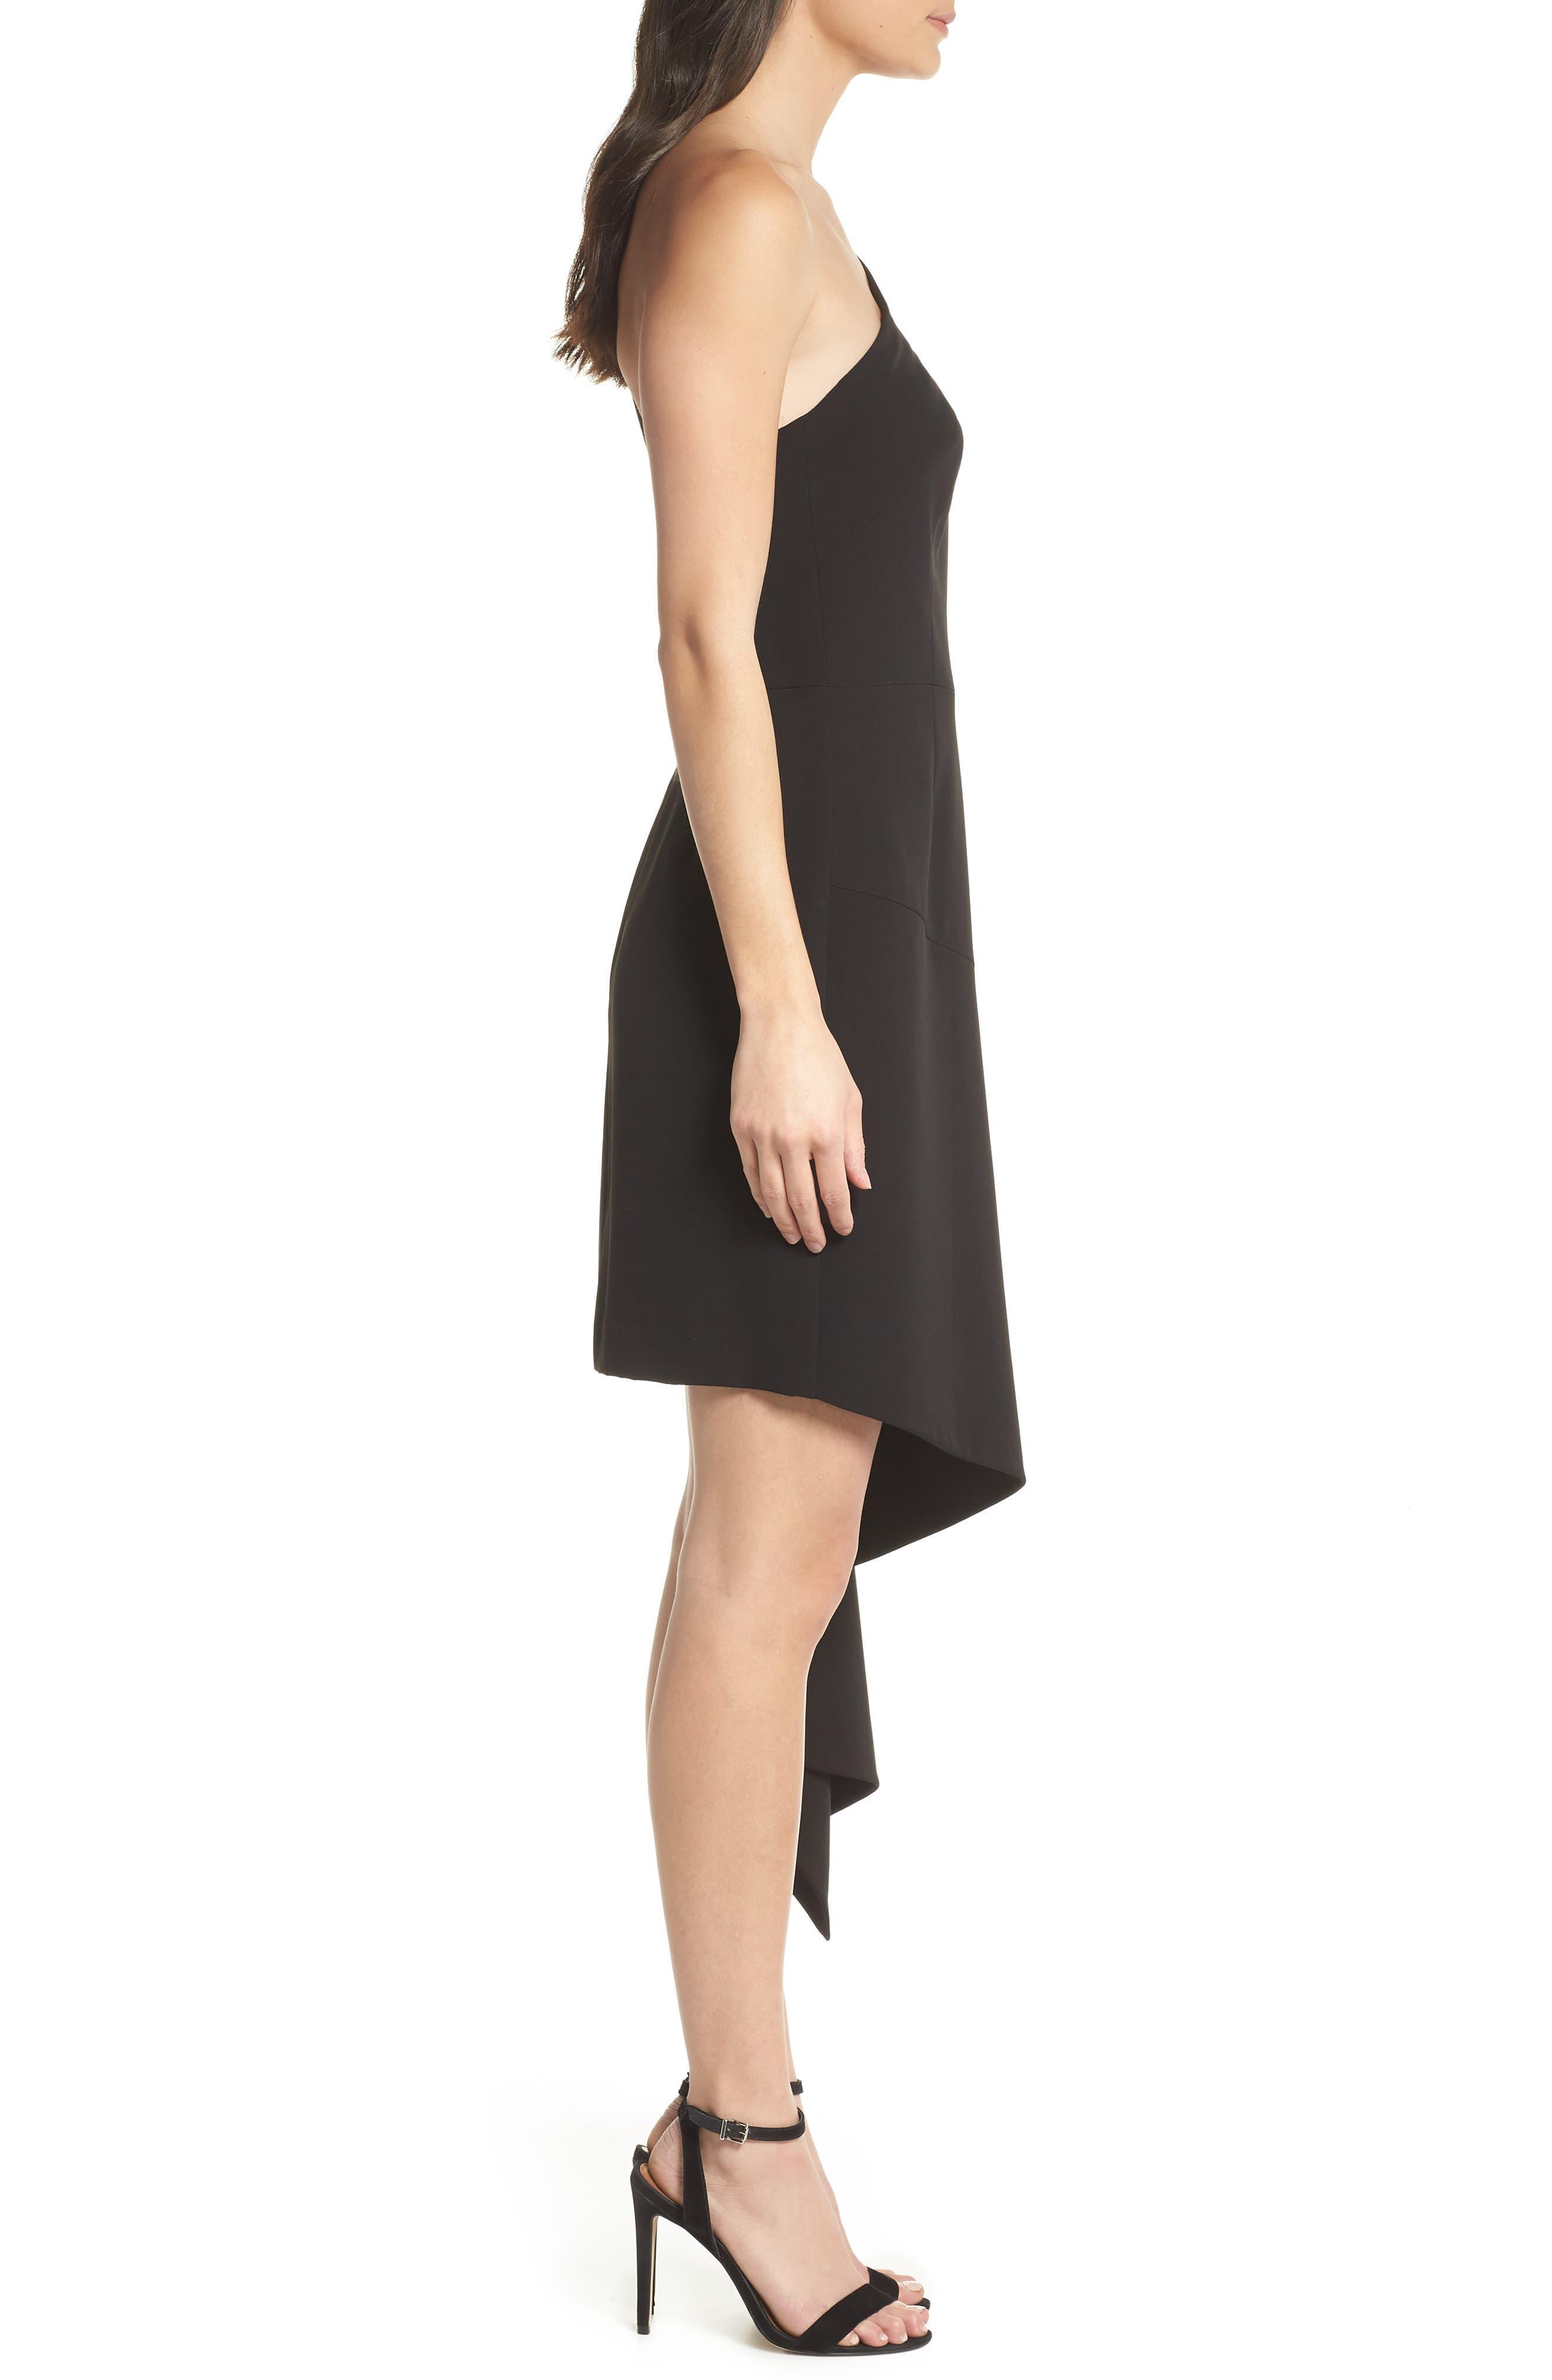 CLOVER AND SLOANE,                             One-Shoulder Asymmetric Dress,                             Alternate thumbnail 3, color,                             001